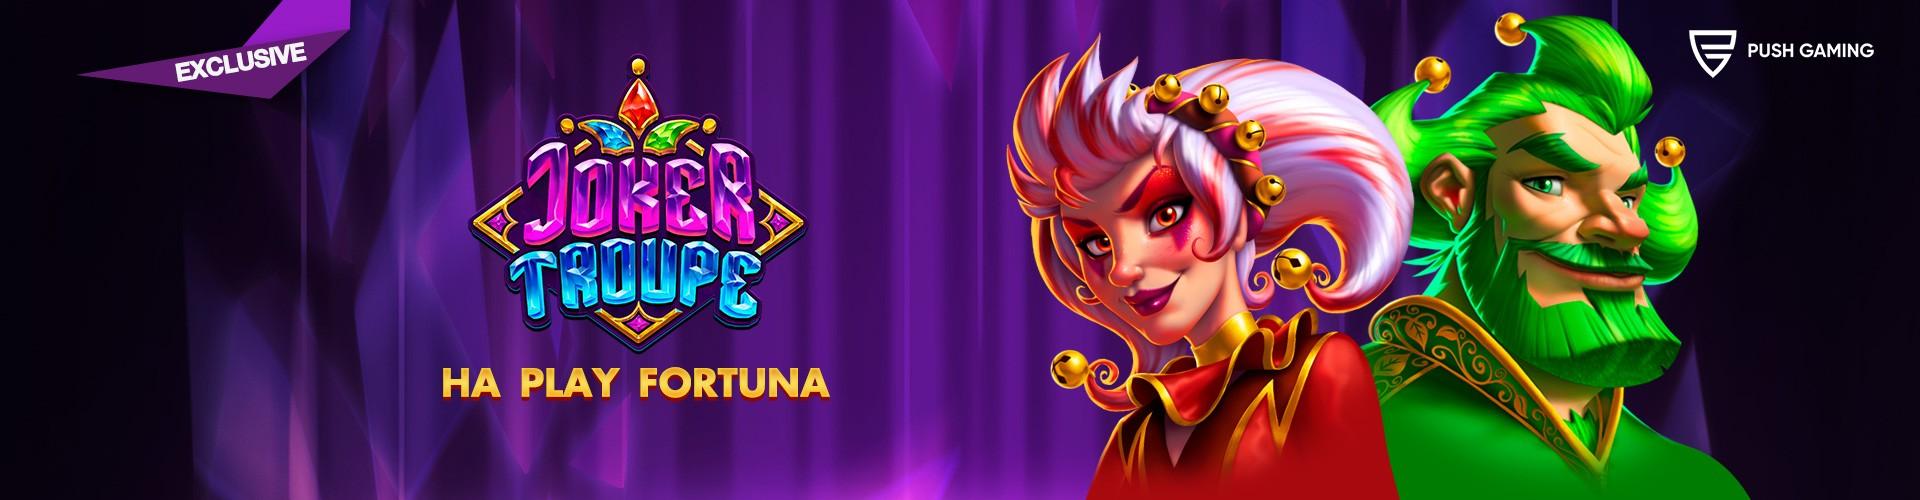 Joker Trouble в казино Плей Фортуна